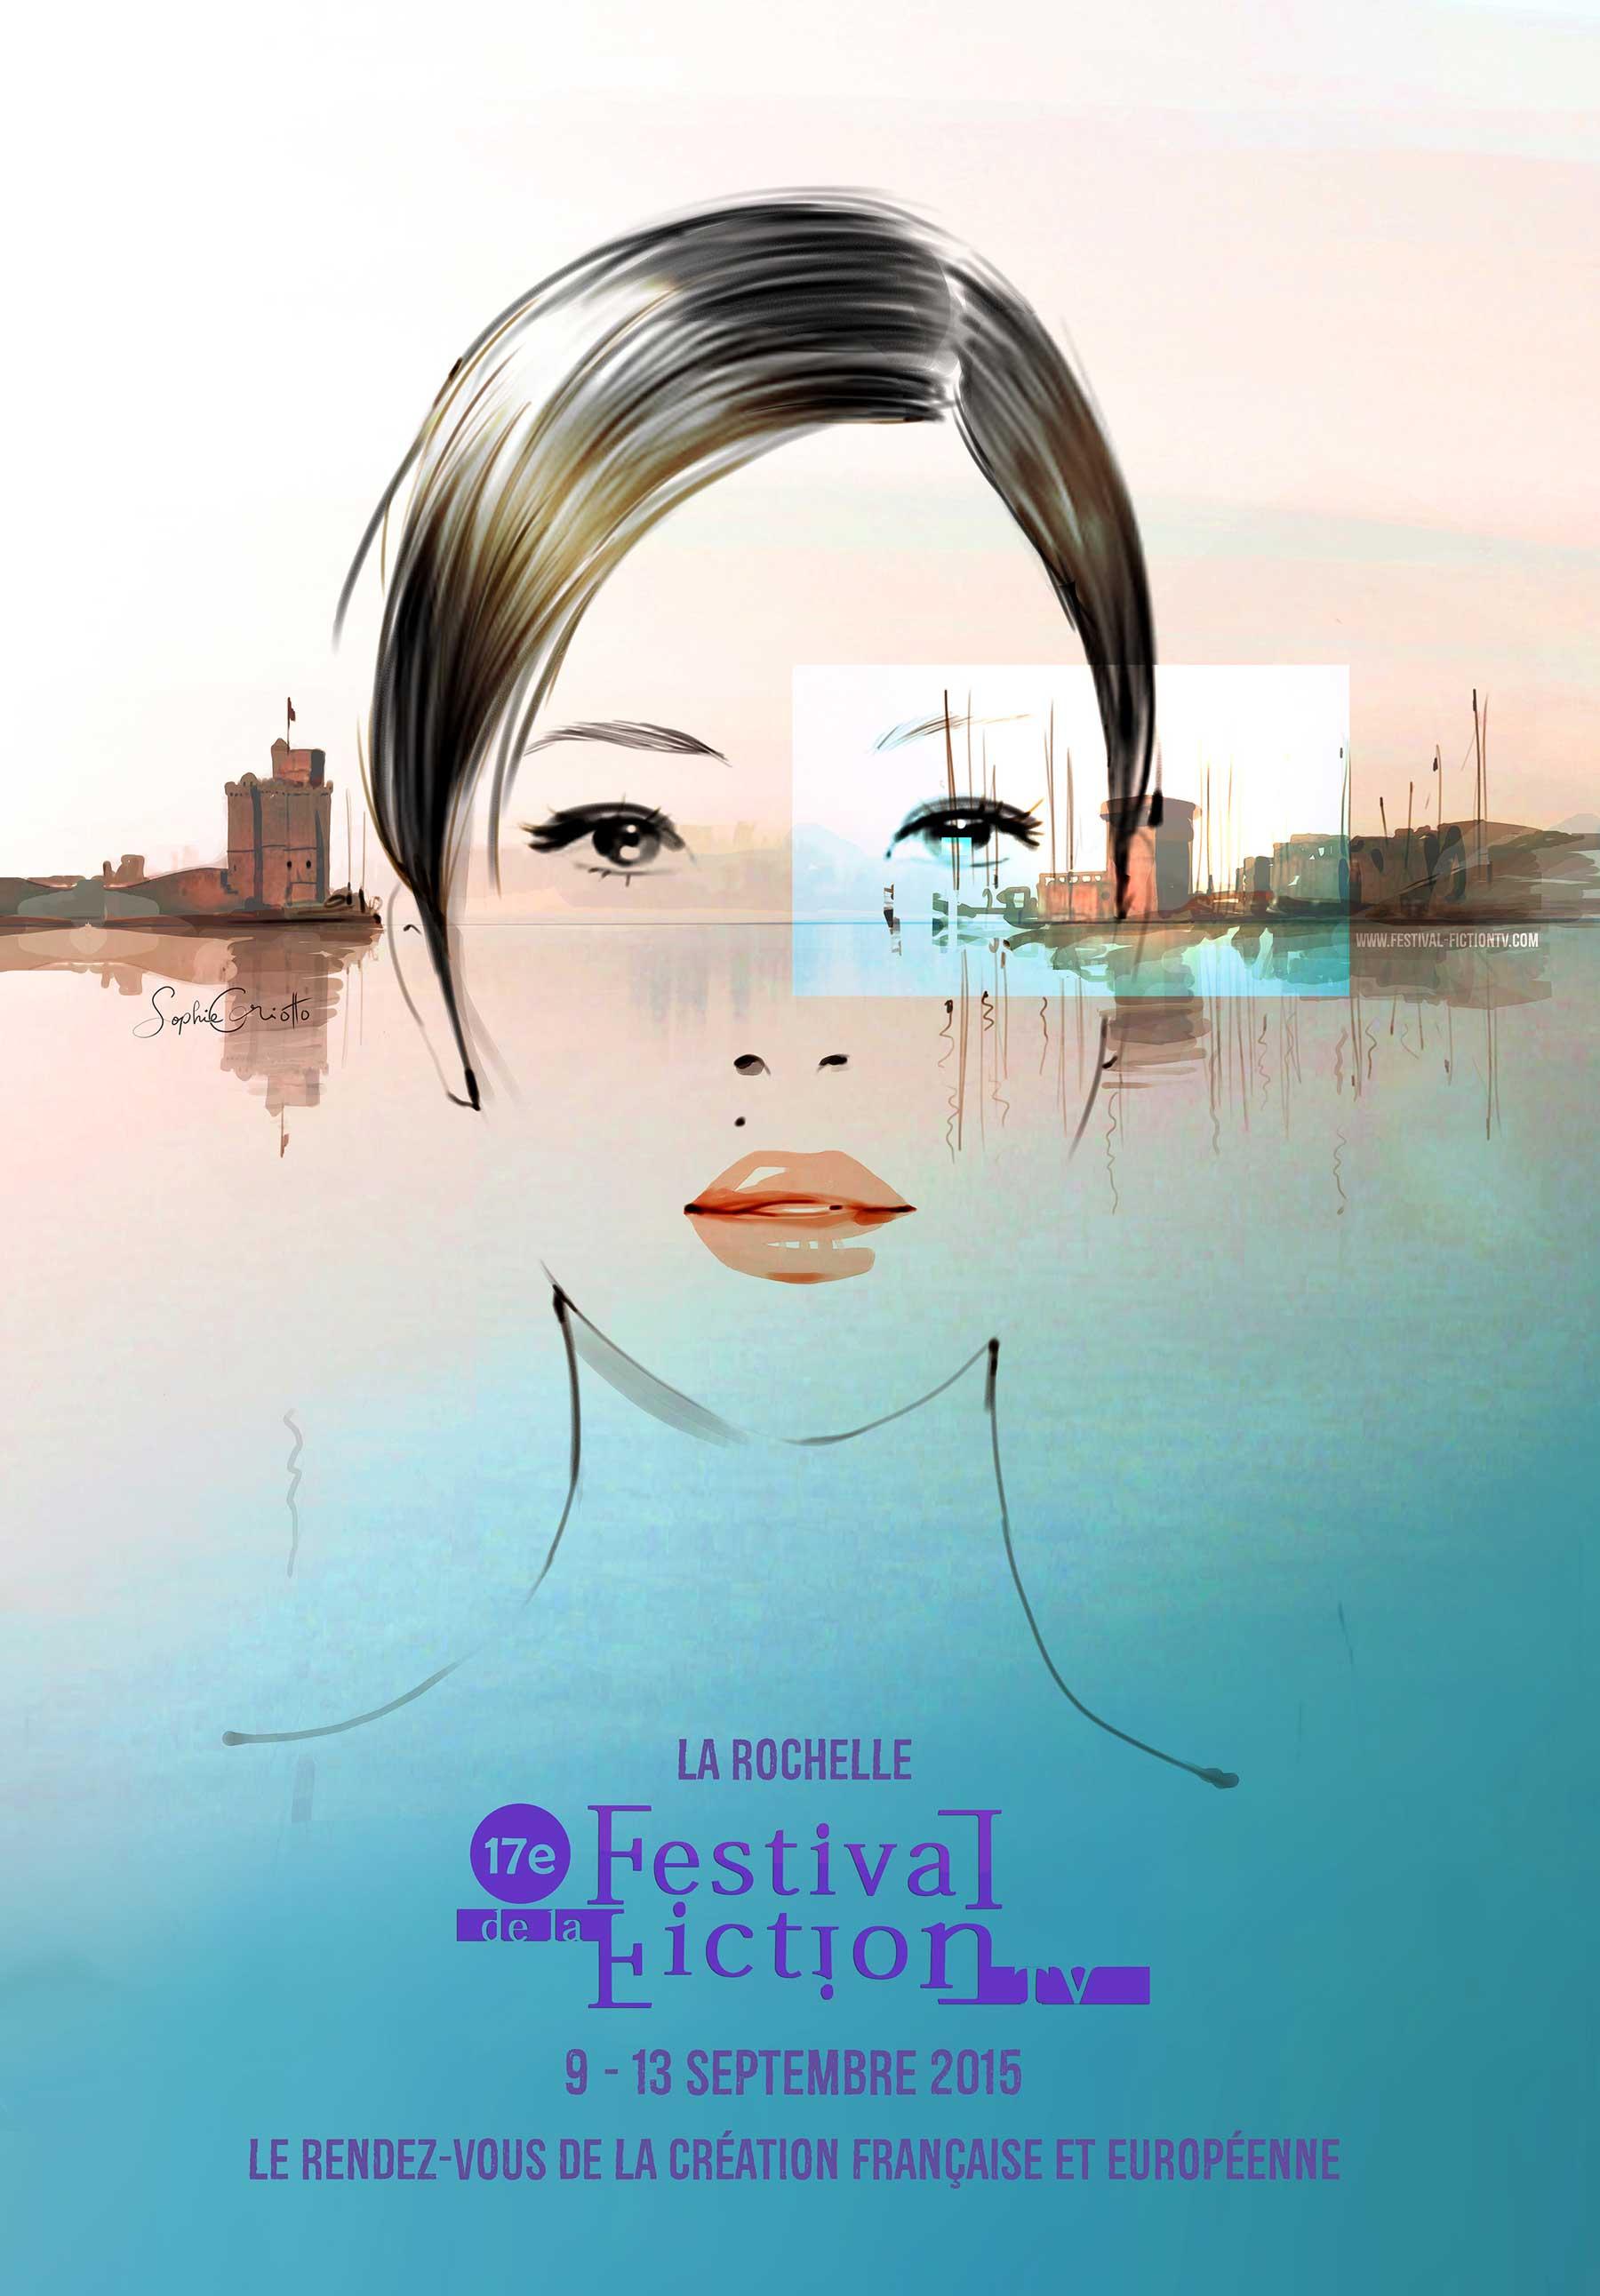 17e Festival de la Fiction TV de La Rochelle